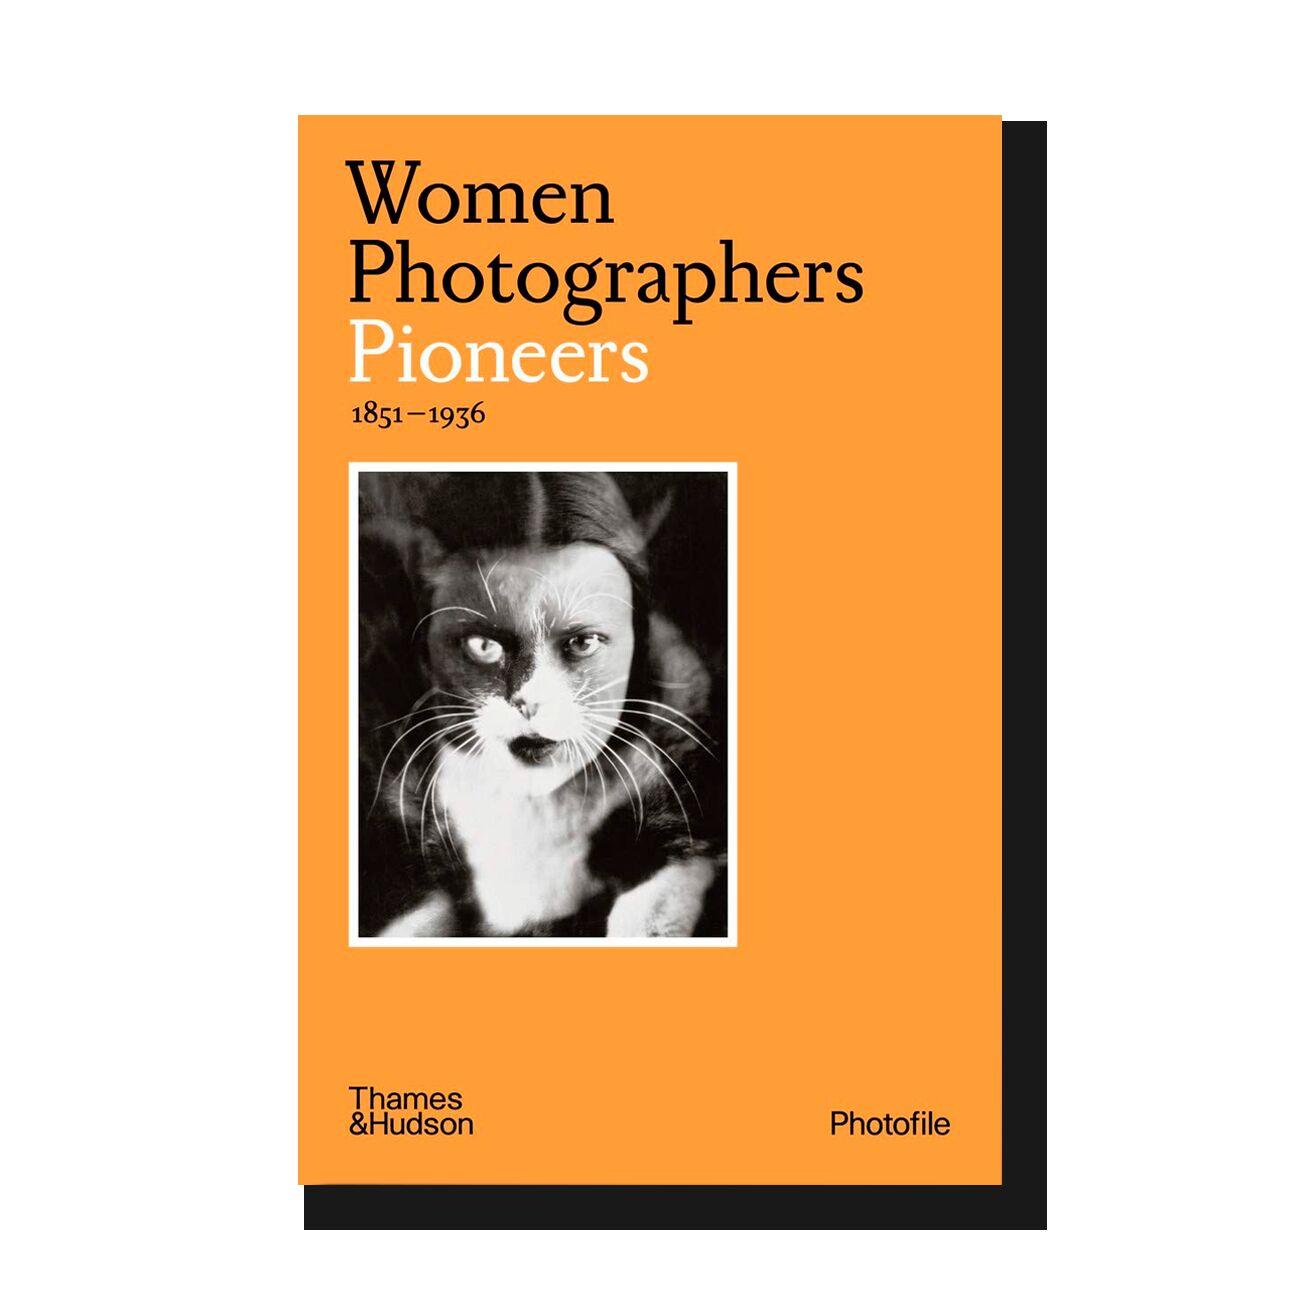 Women Photographers: Pioneers